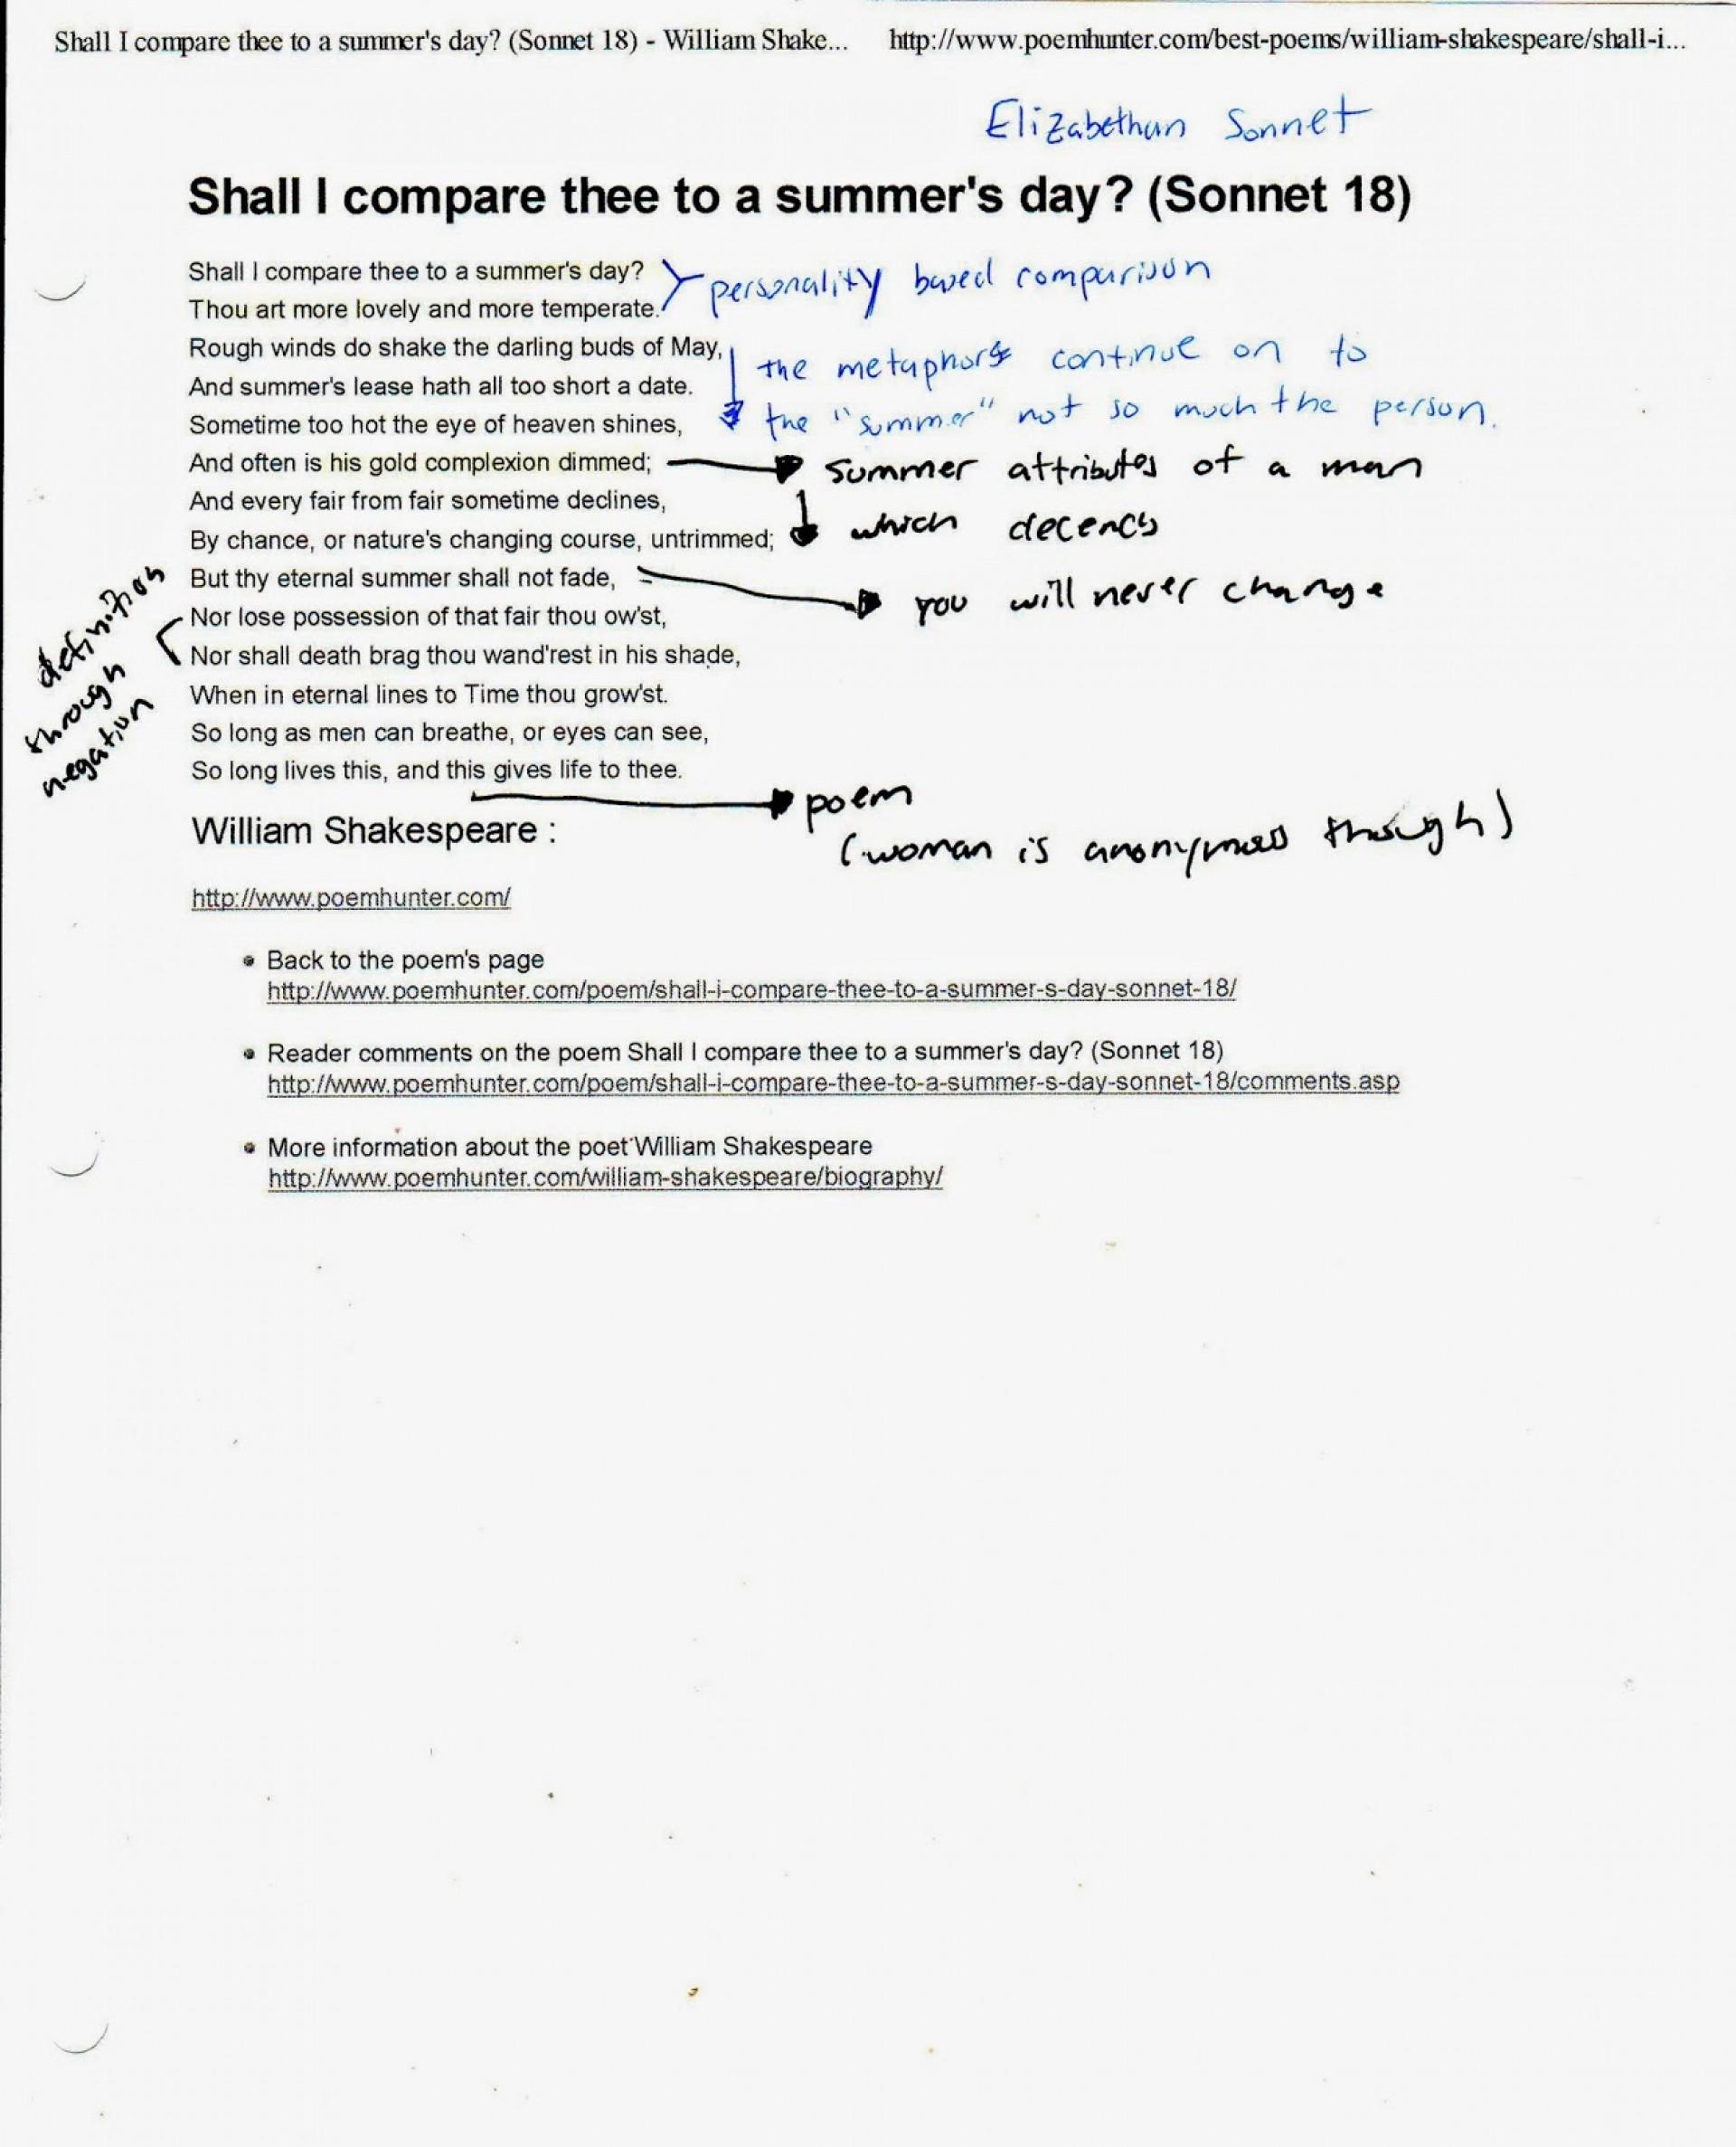 002 Essay Example Rare Shakespeare Hamlet Topics Macbeth Examples Titles 1920